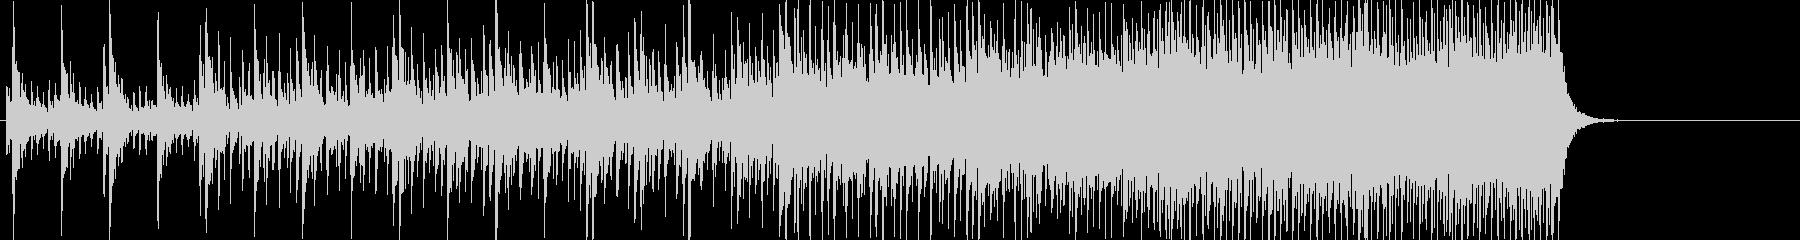 creo_leo_bgm43の未再生の波形